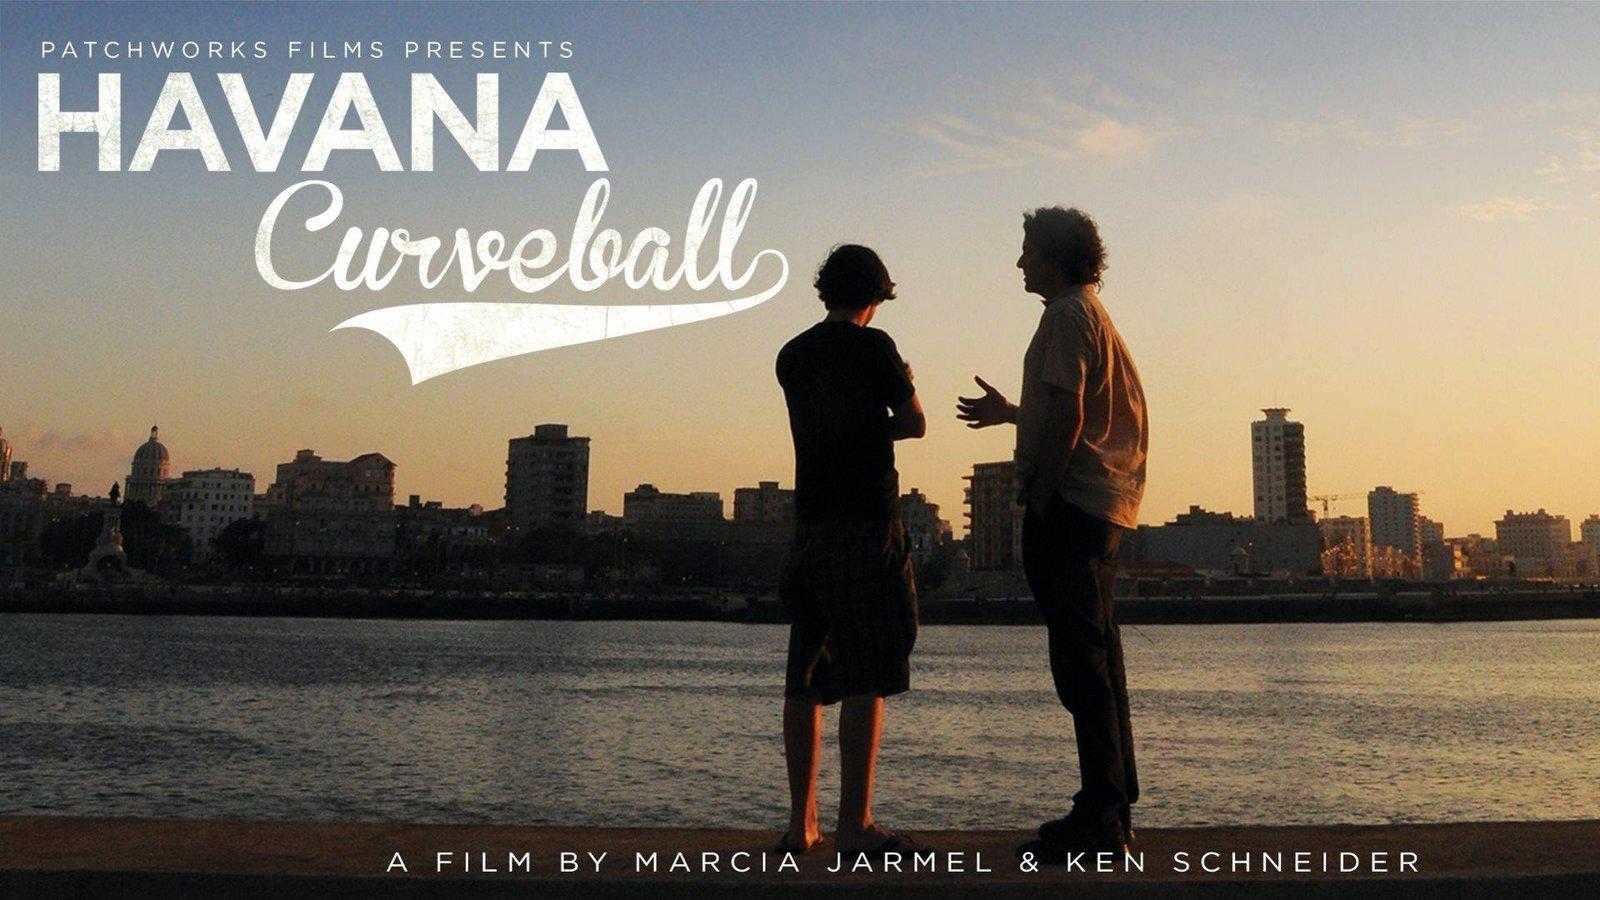 Havana Curveball